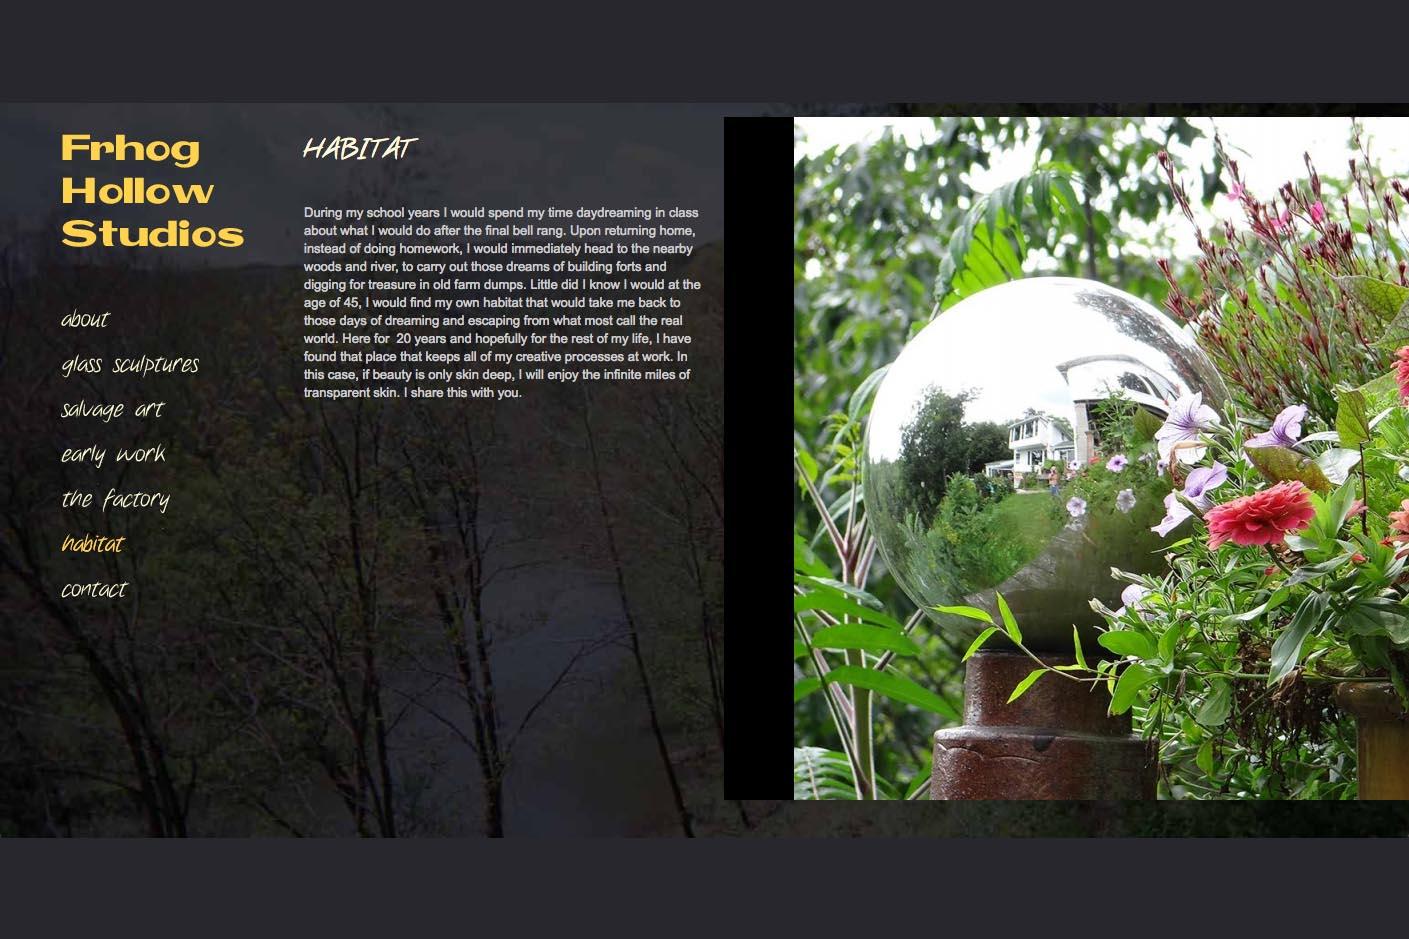 web design for a glass sculpture artist - habitat page